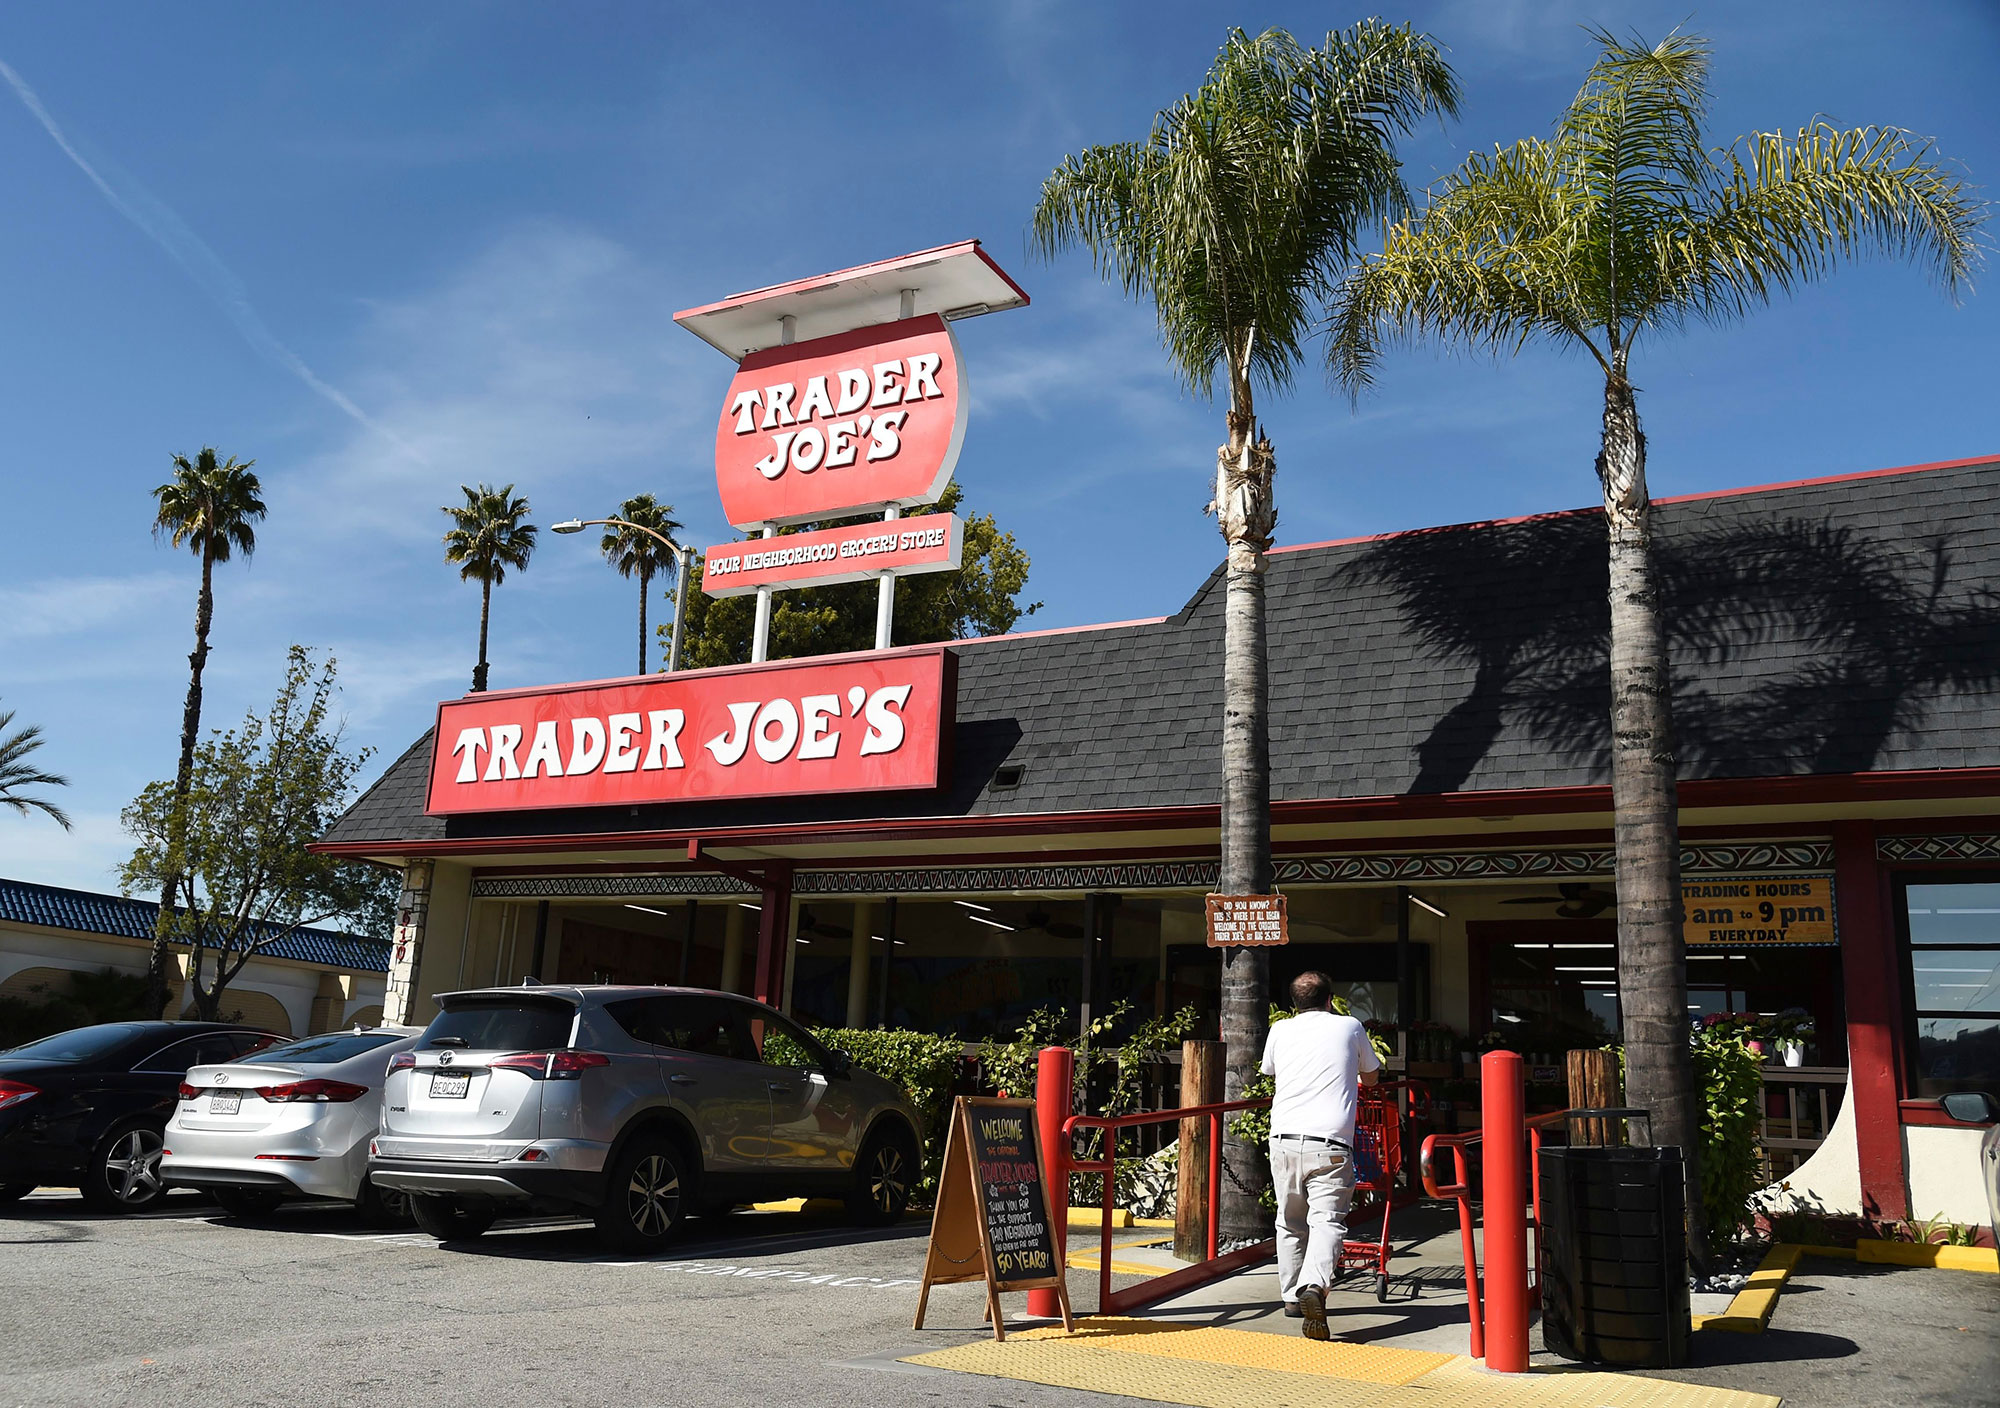 Obit Trader Joe's Founder, Pasadena, USA - 26 Feb 2020